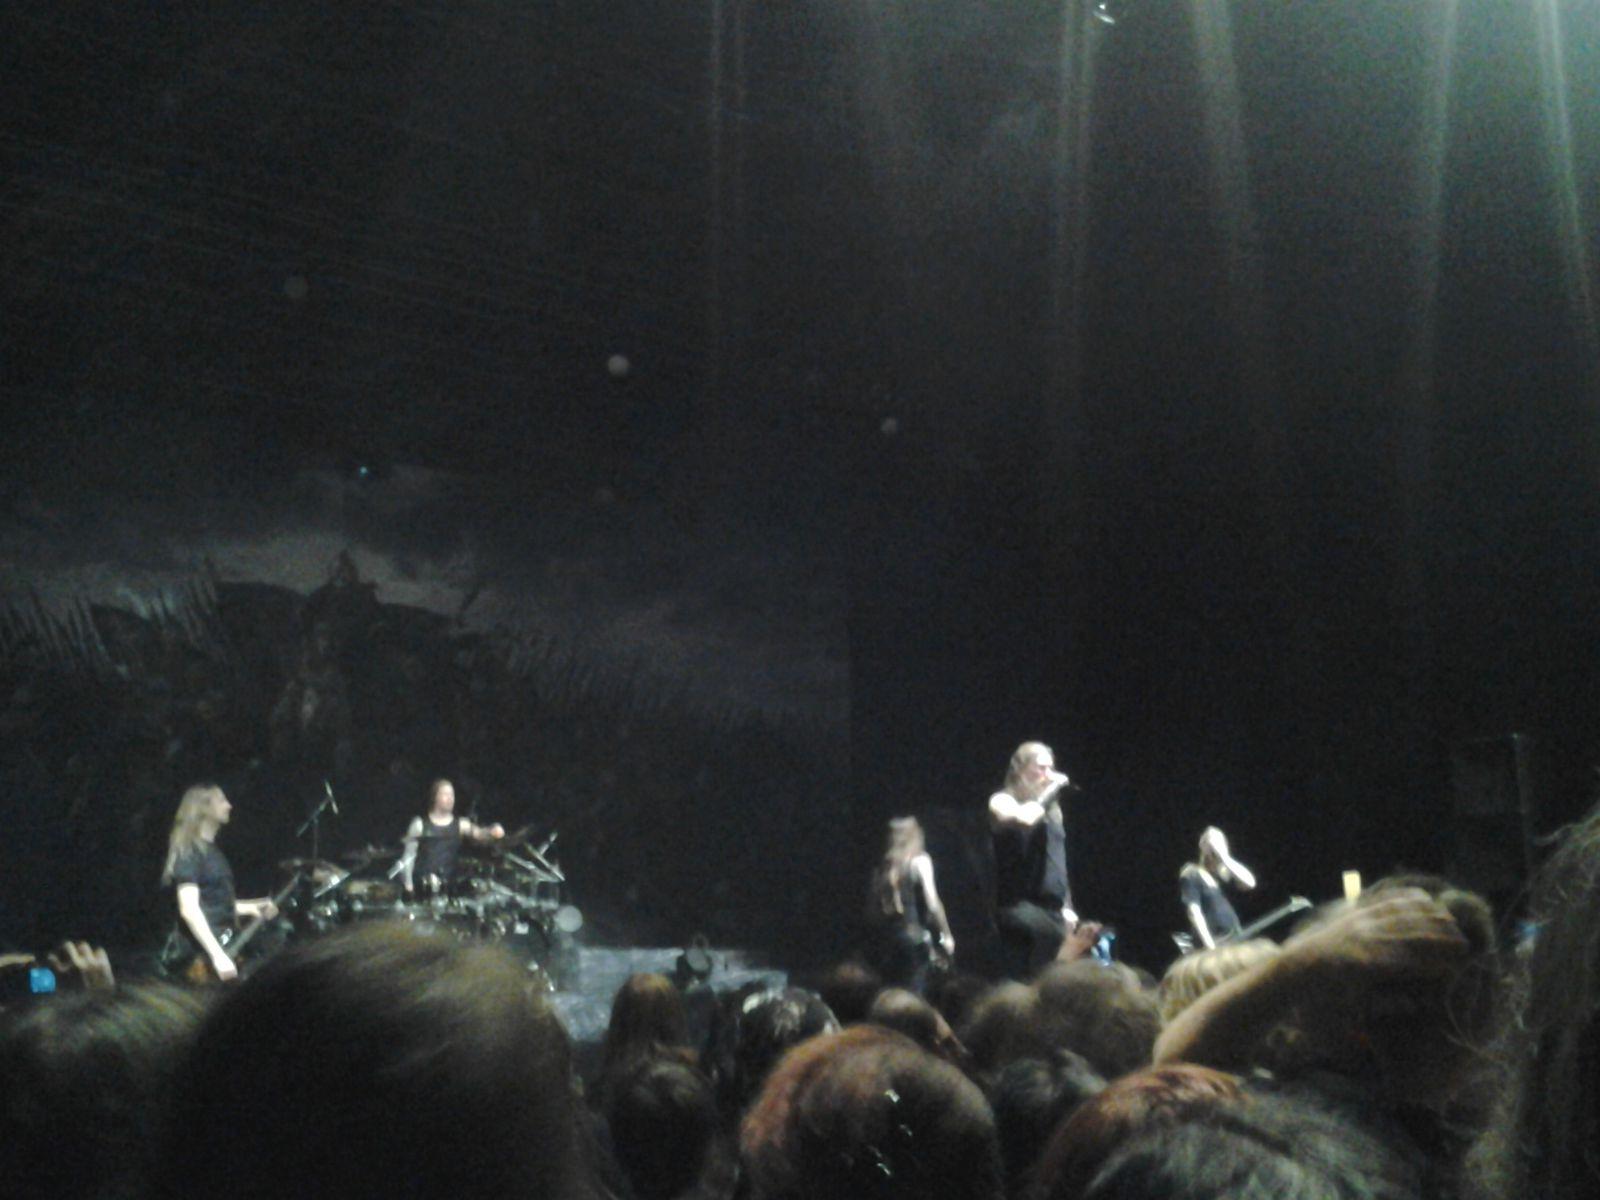 Amon Amarth + Carcass + Hell, 18/11/13, Paris